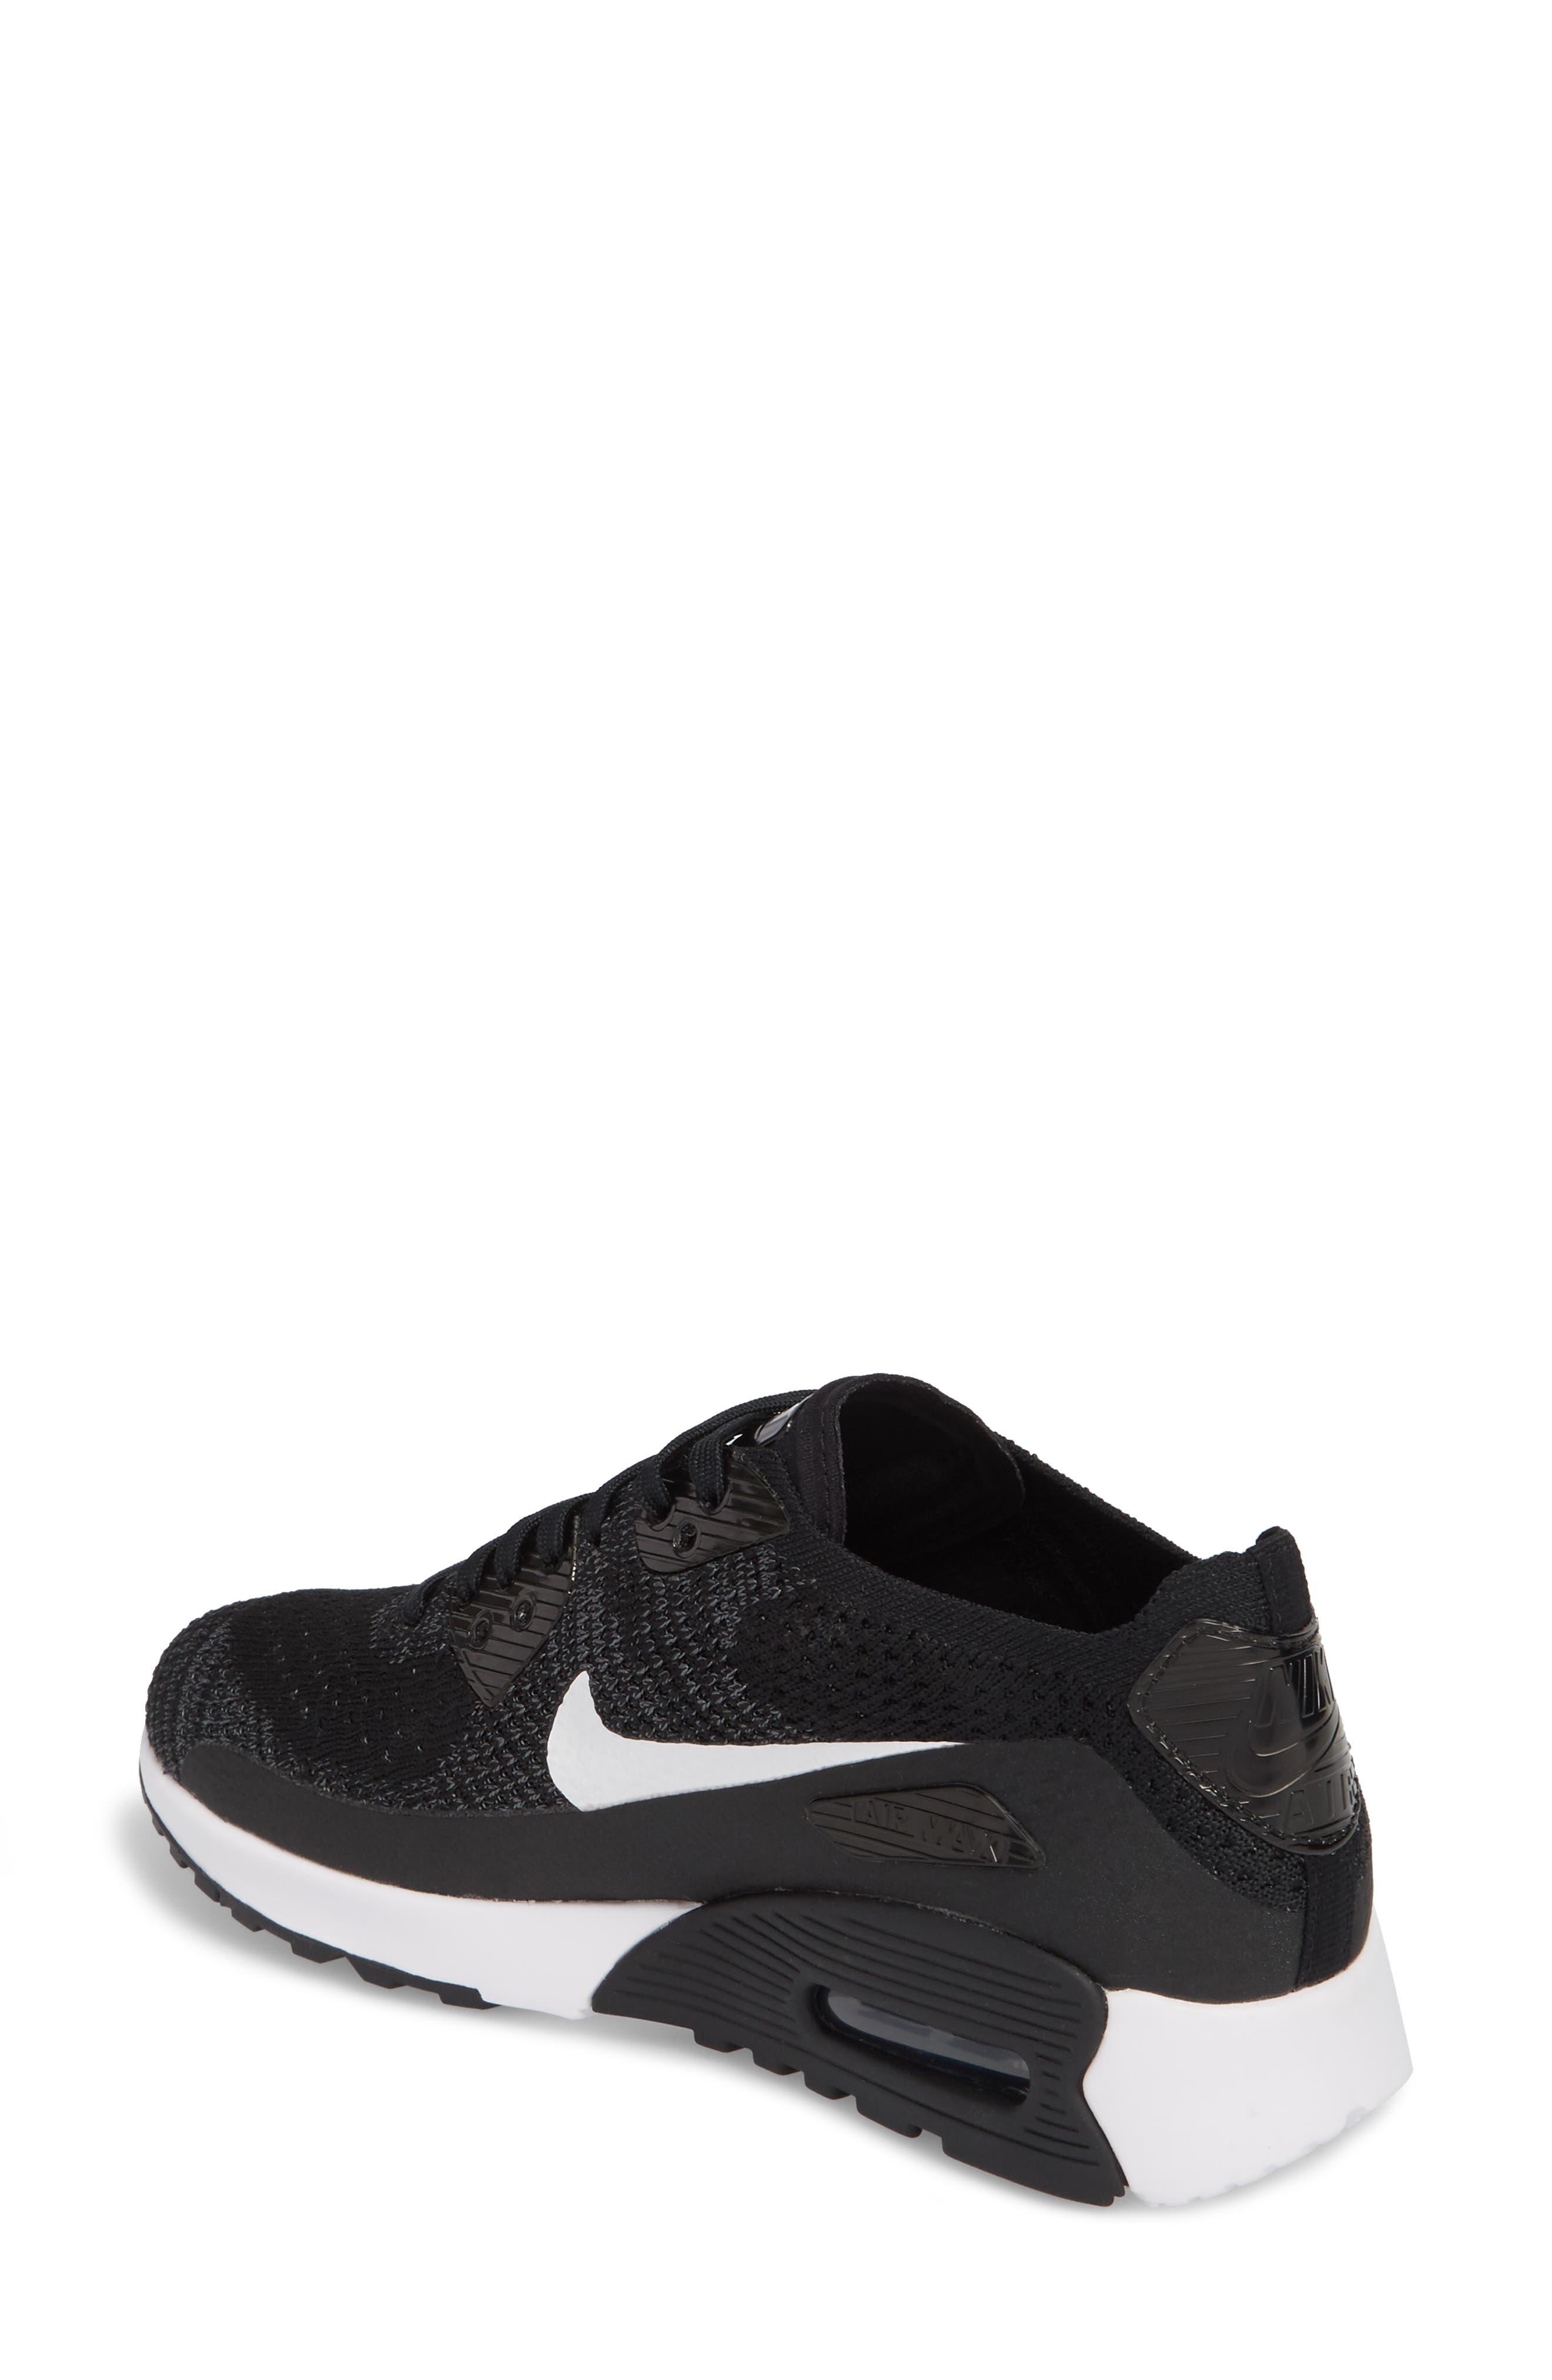 Air Max 90 Flyknit Ultra 2.0 Sneaker,                             Alternate thumbnail 2, color,                             004